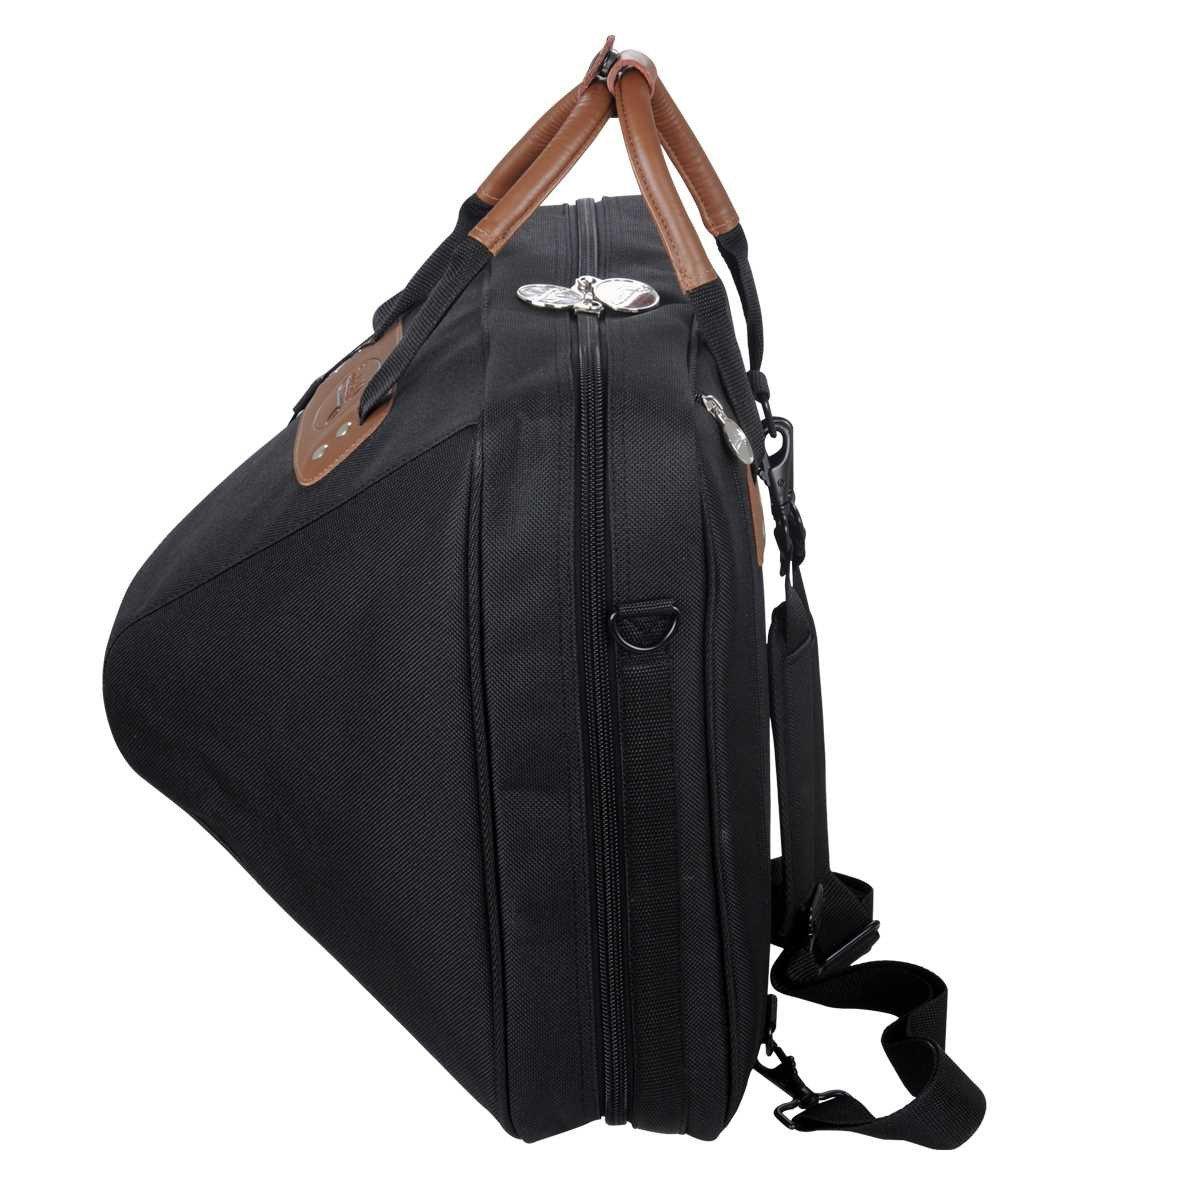 Durable French Split Horn Gig Bag Soft Case 1200D Waterproof Cloth E-6A Black Jinchuan